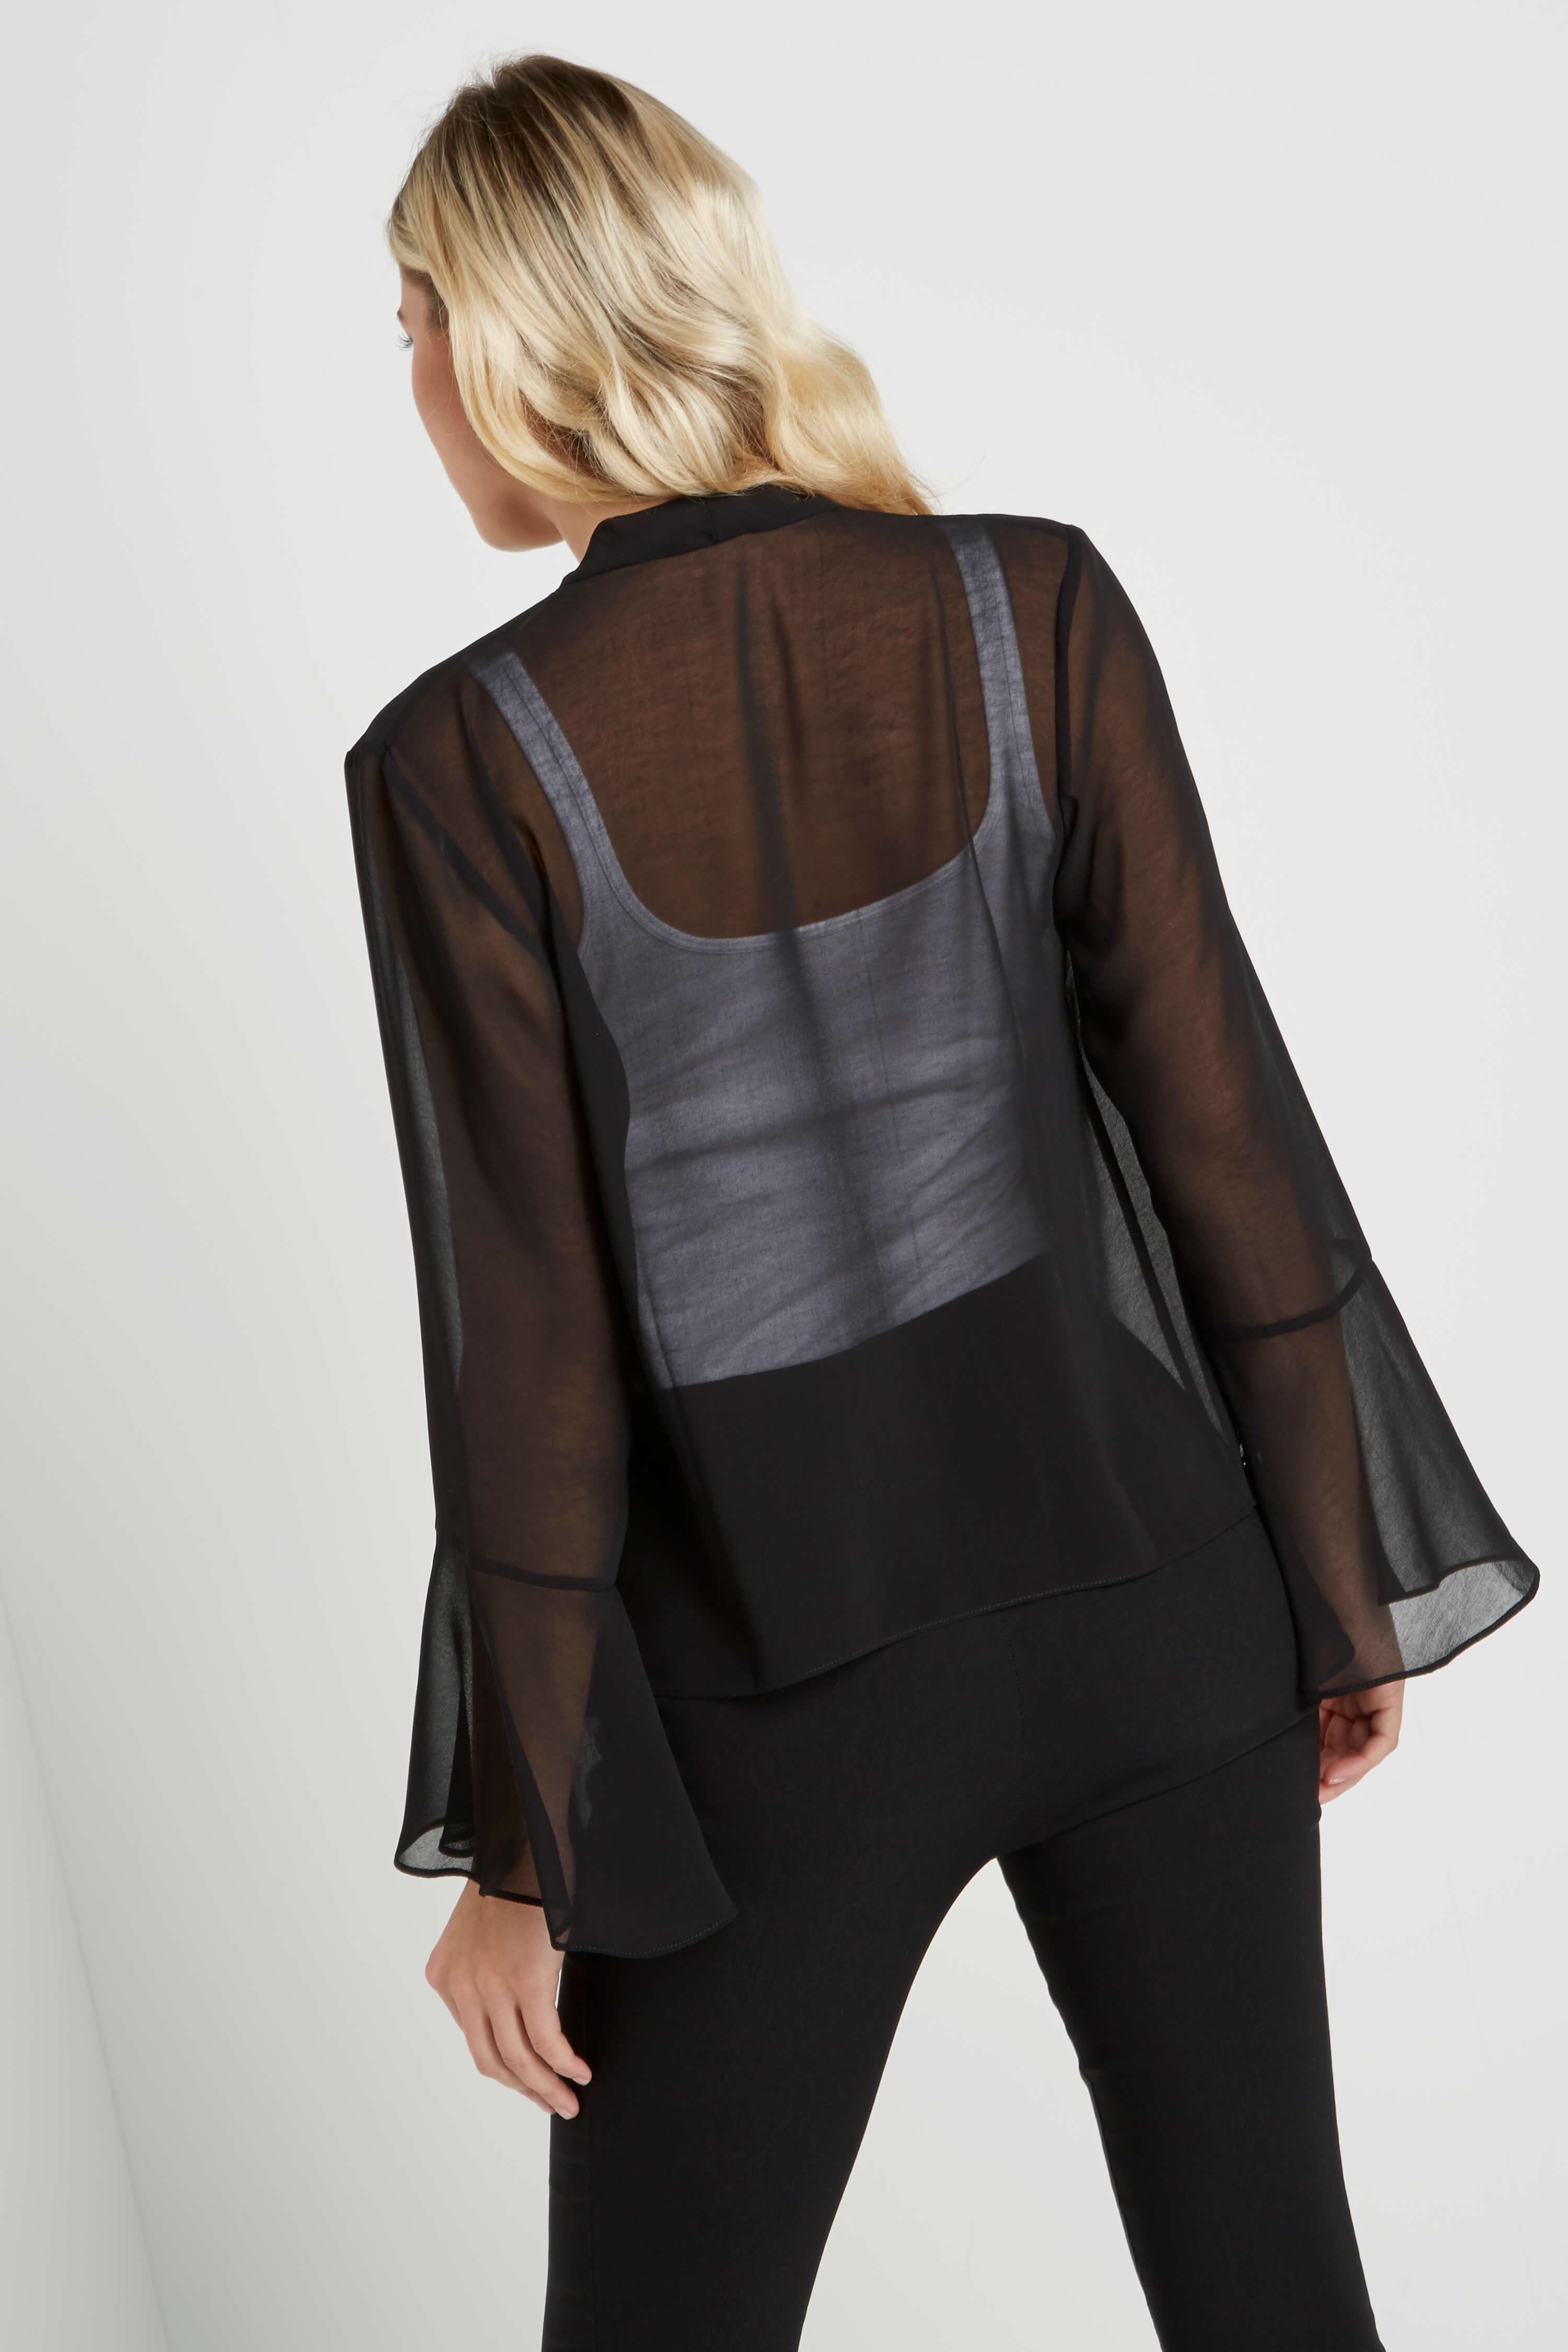 Roman-Originals-Women-039-s-Black-Sheer-Chiffon-Jacket-Sizes-10-20 thumbnail 13